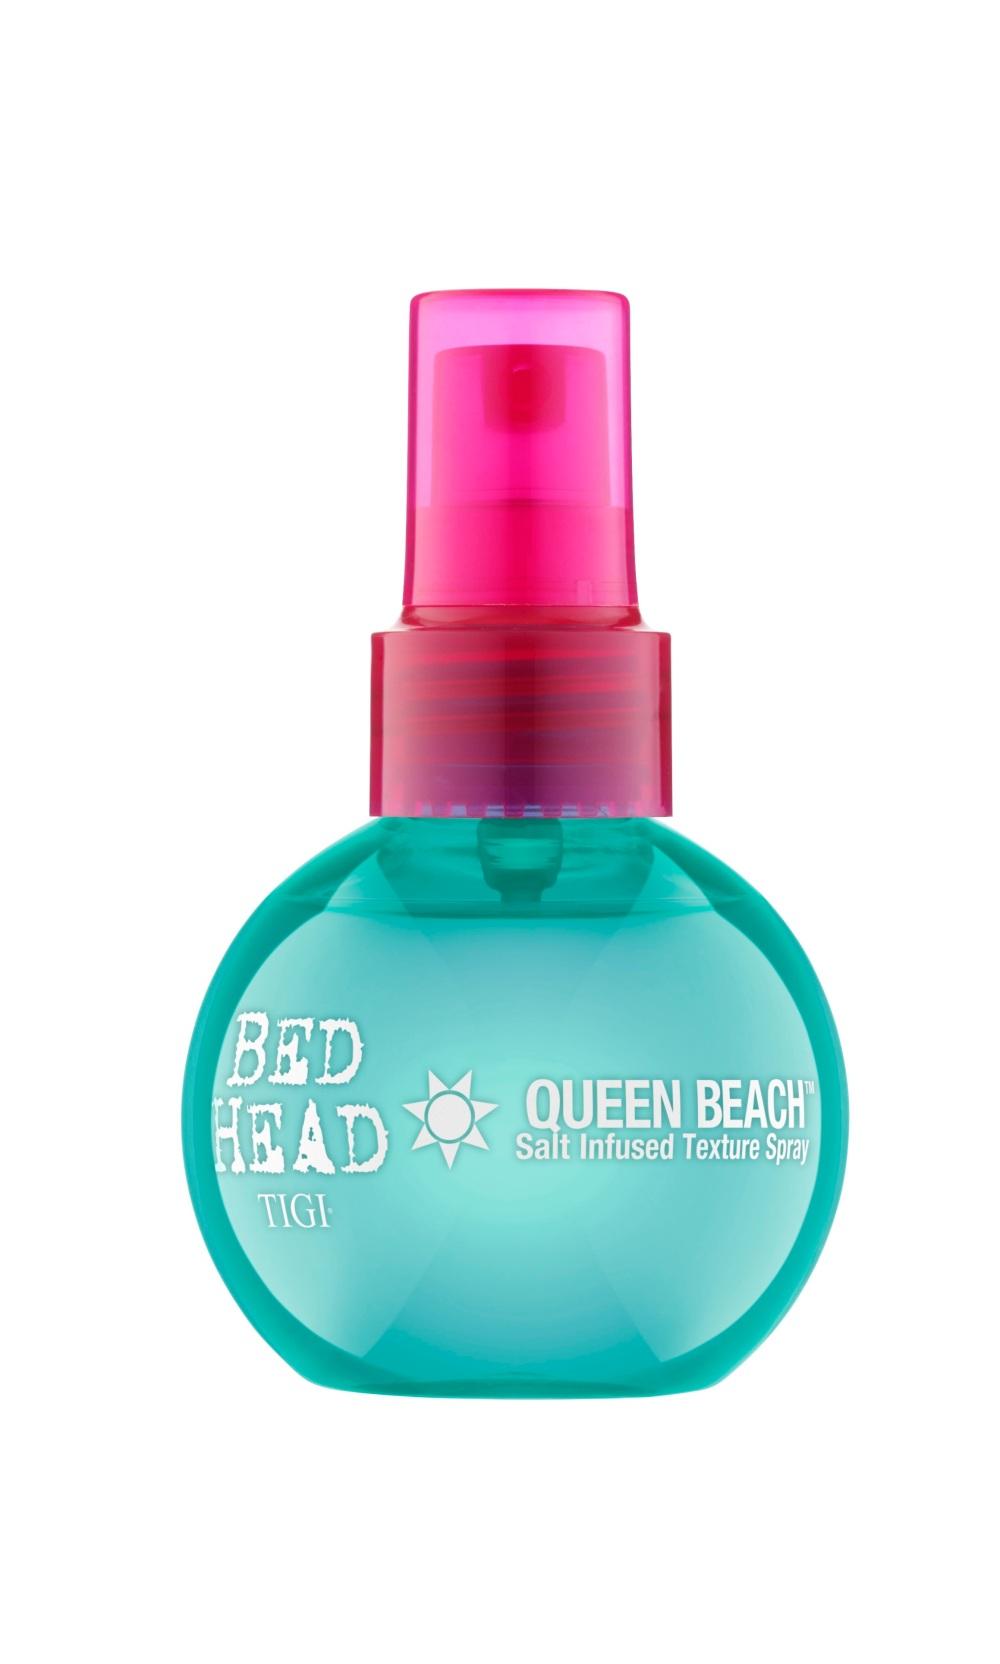 TIGI BED HEAD QUEEN BEACH SALT SPRAY